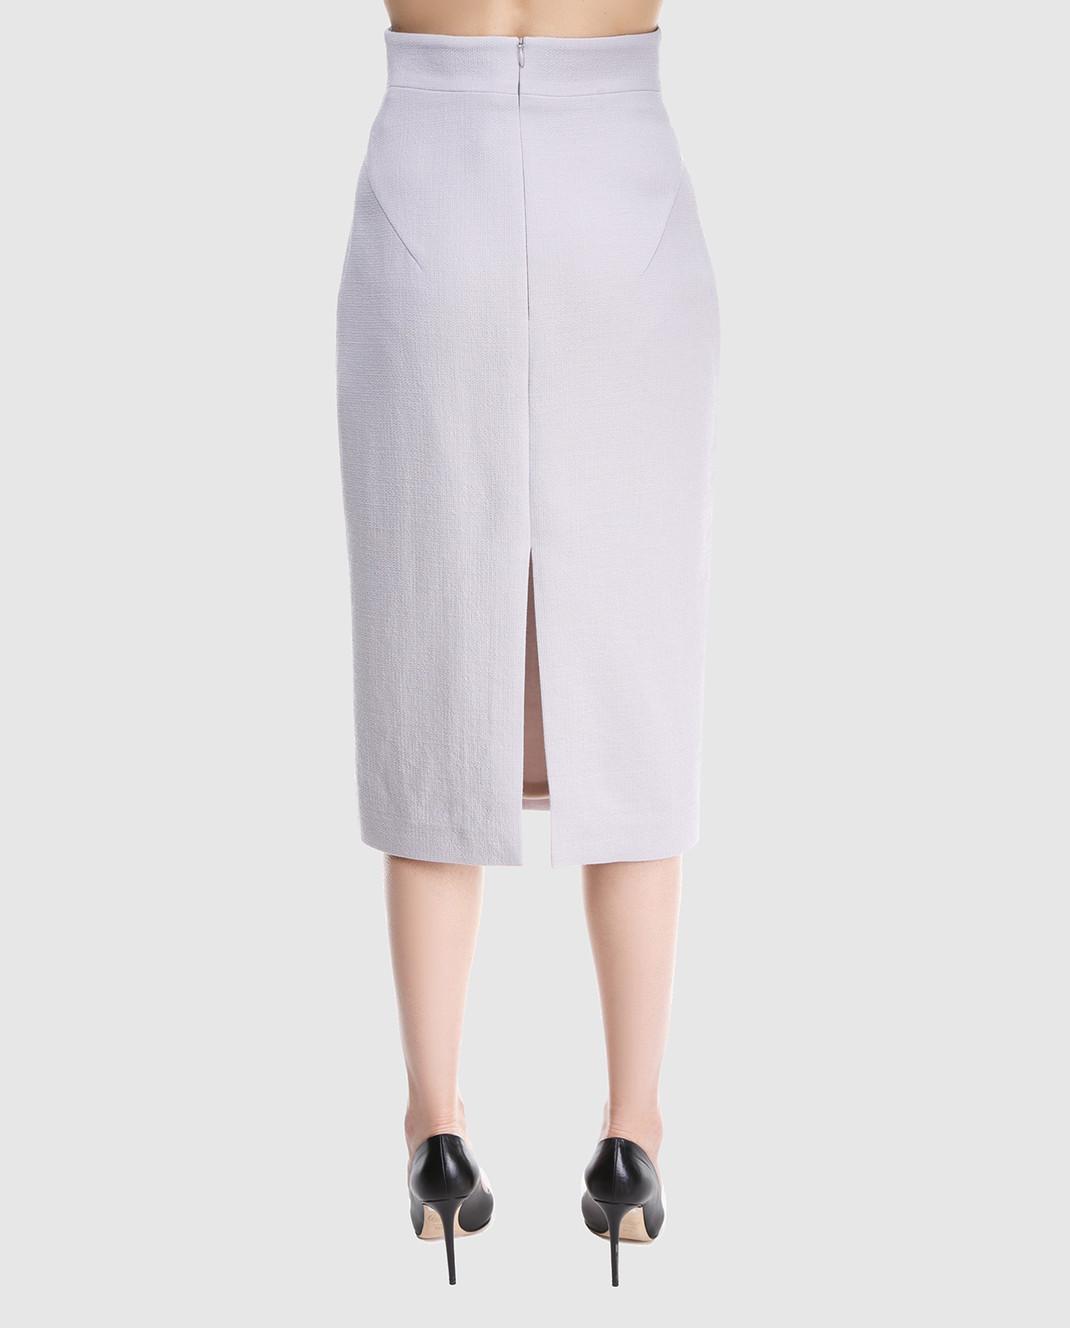 A la Russe Светло-серая юбка 371004 изображение 4